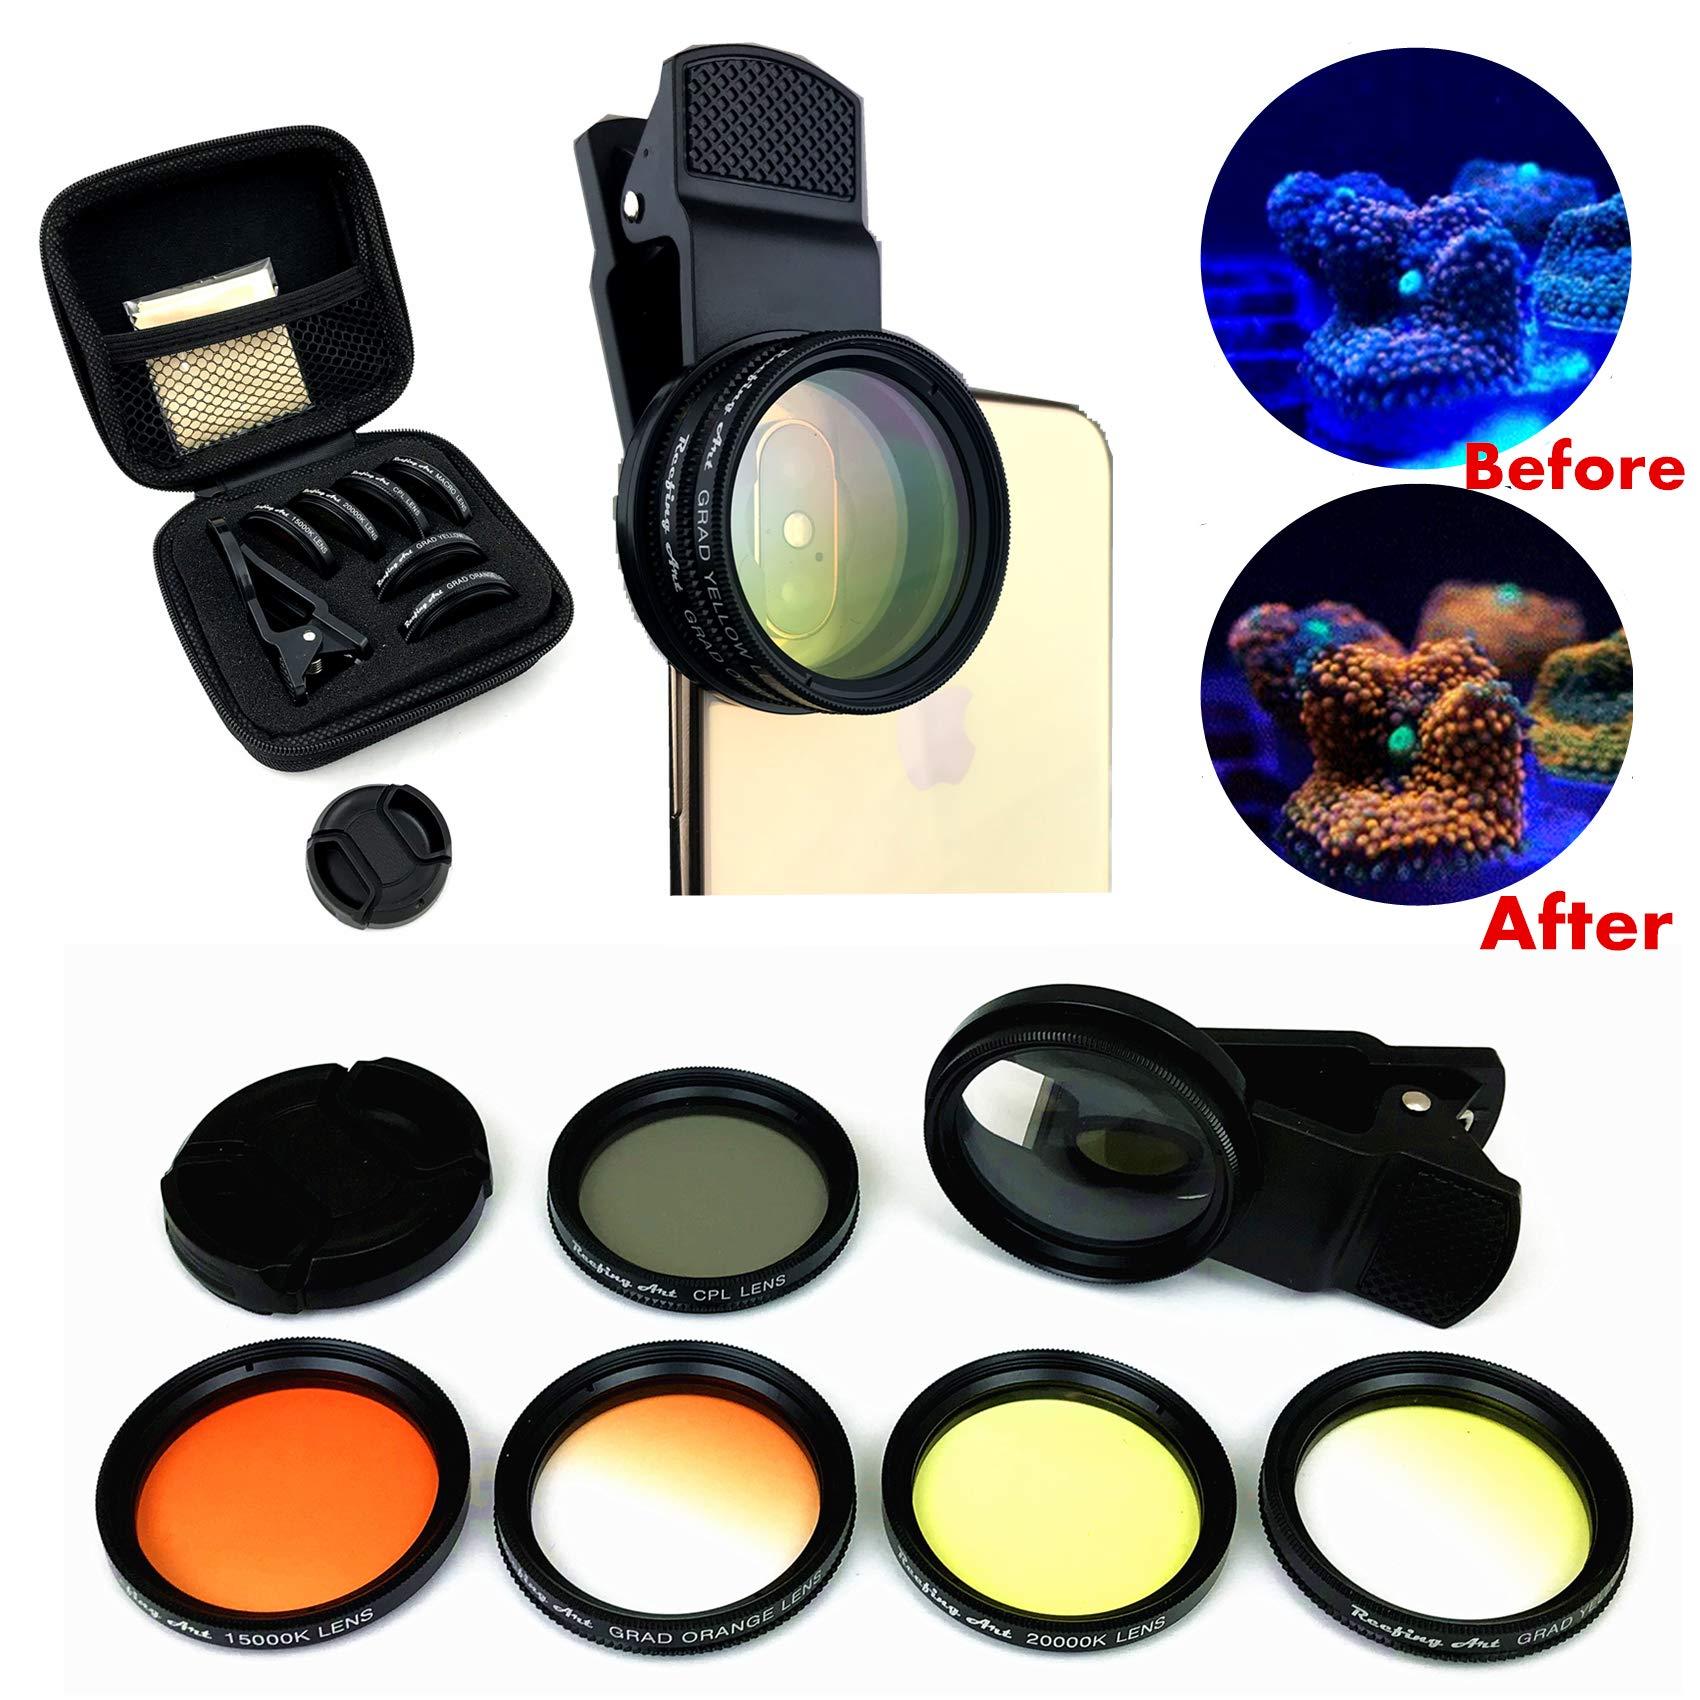 Reefing Art Coral Lens Professional Photography 6Lenses Kit frag Rack Aquarium by Reefing Art